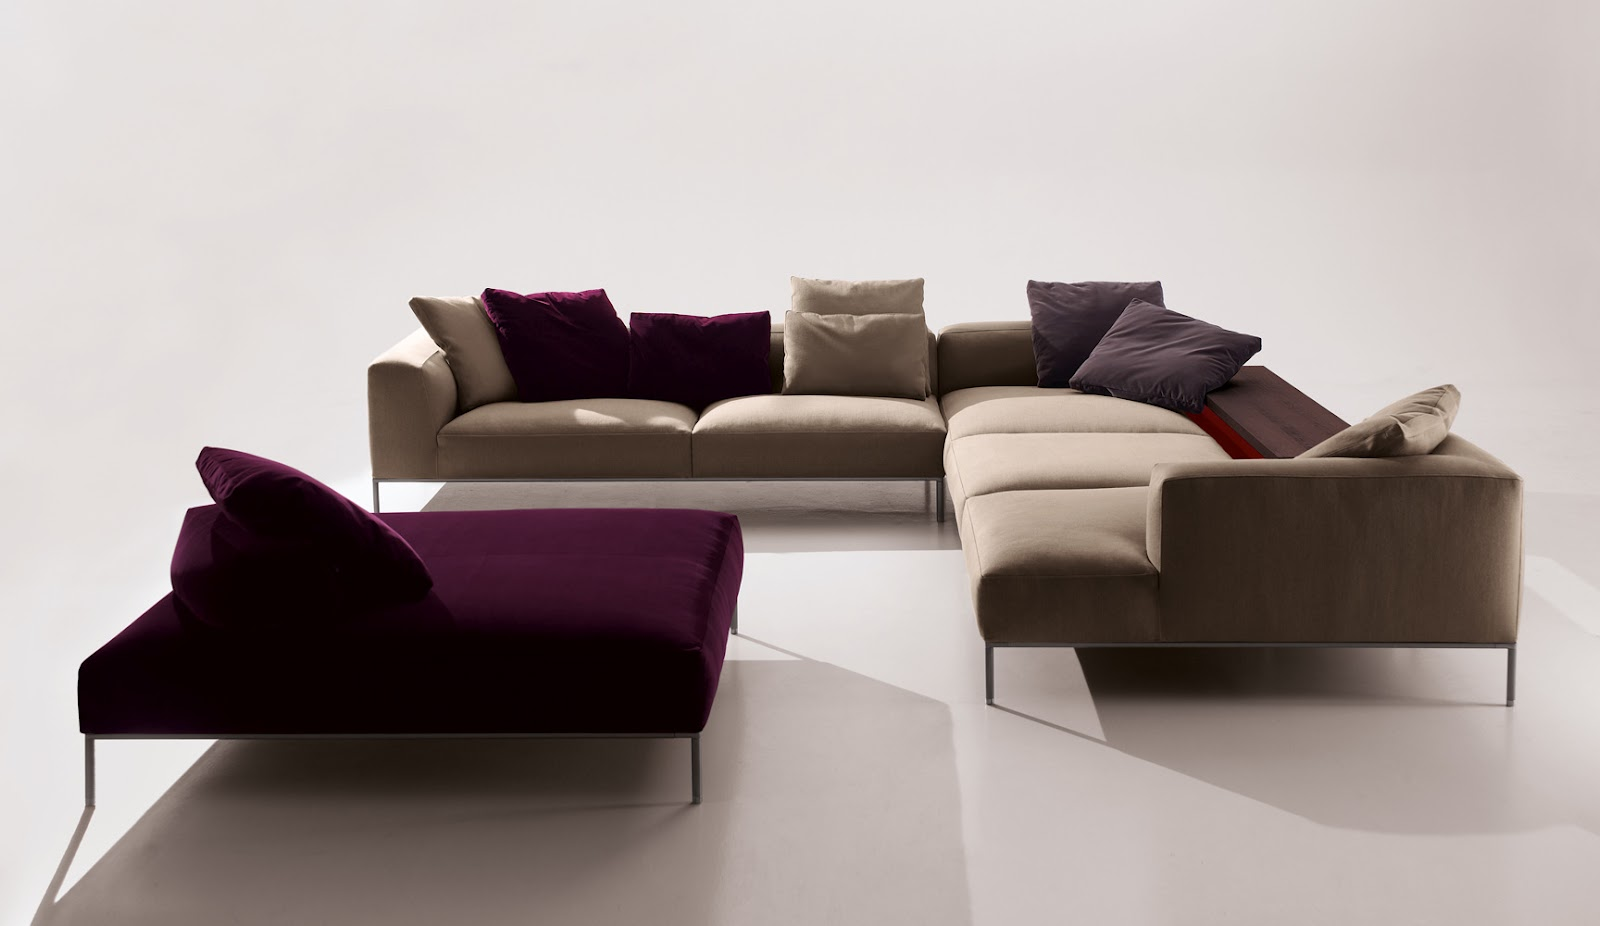 designer leather sofa singapore sofa design. Black Bedroom Furniture Sets. Home Design Ideas